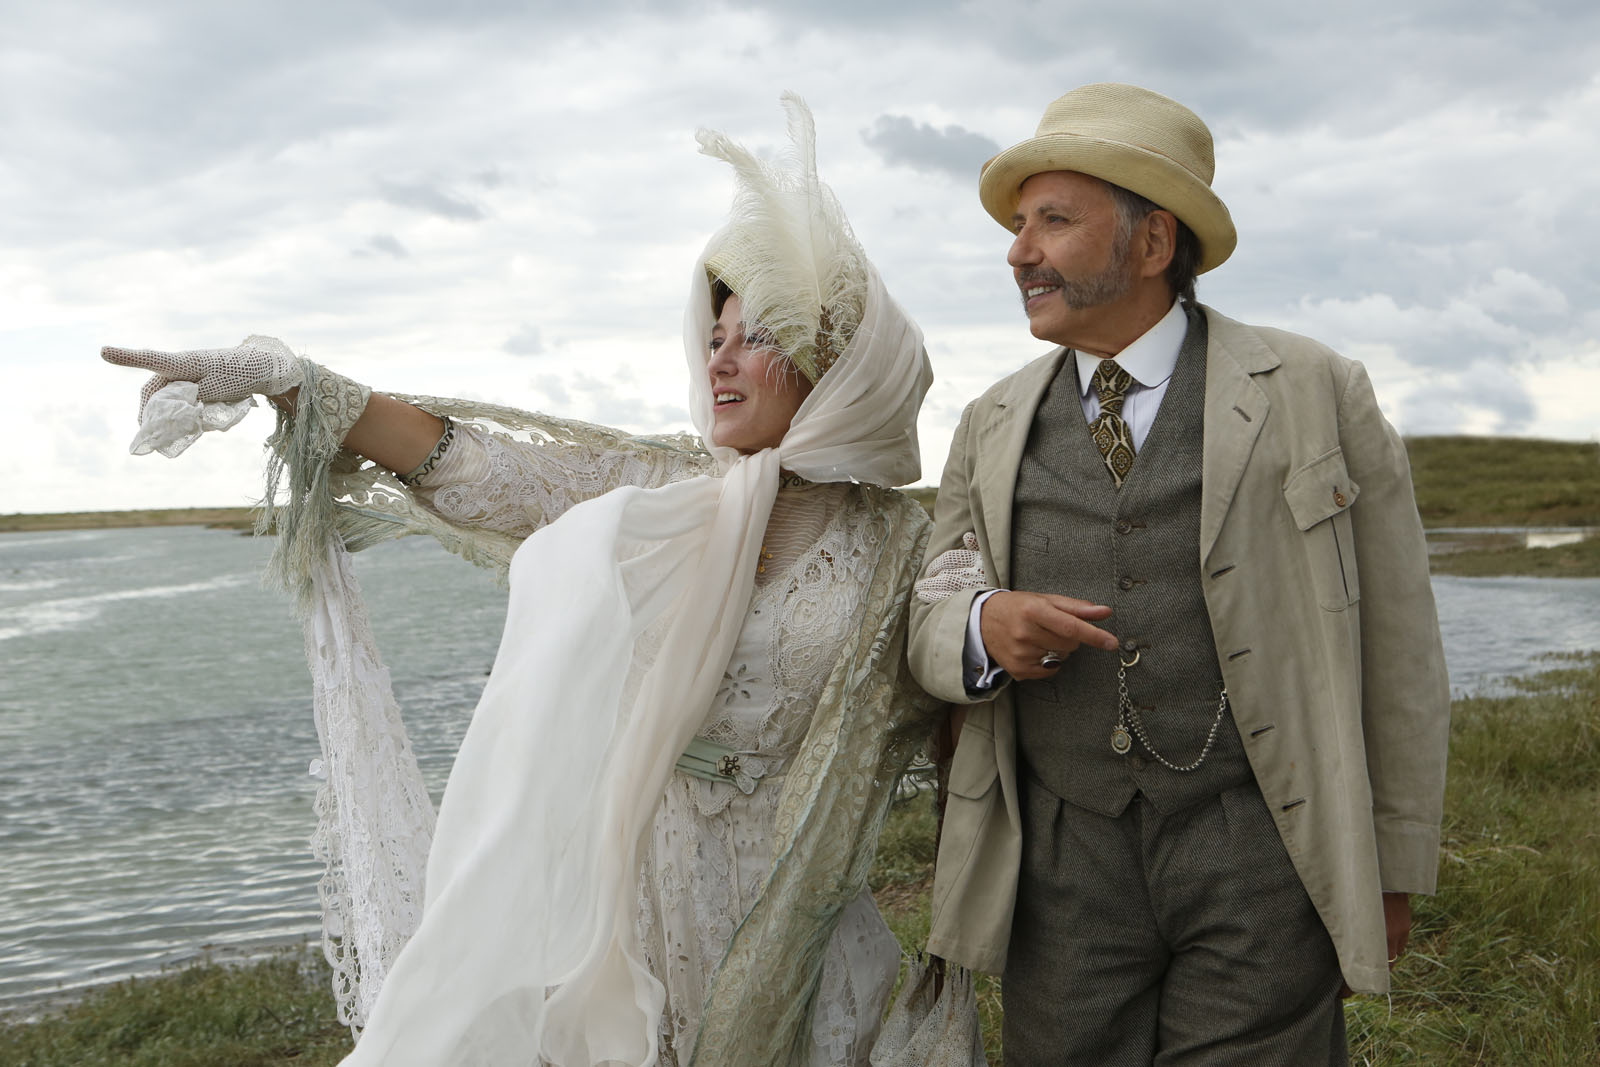 Ma-Loute-Film-Cannes-Image-1